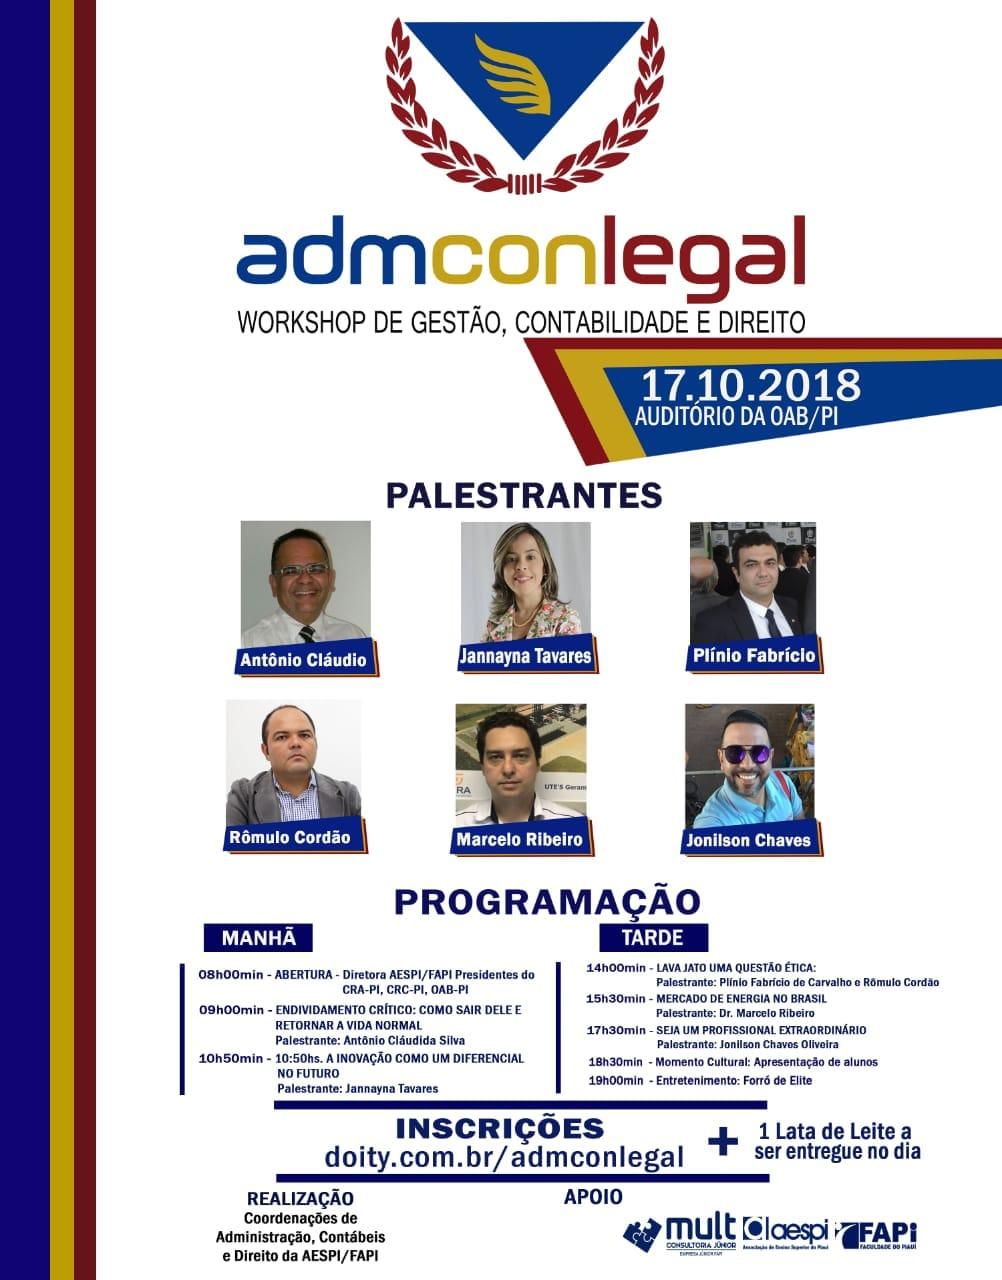 Admconlegal - Daniel Carvalho